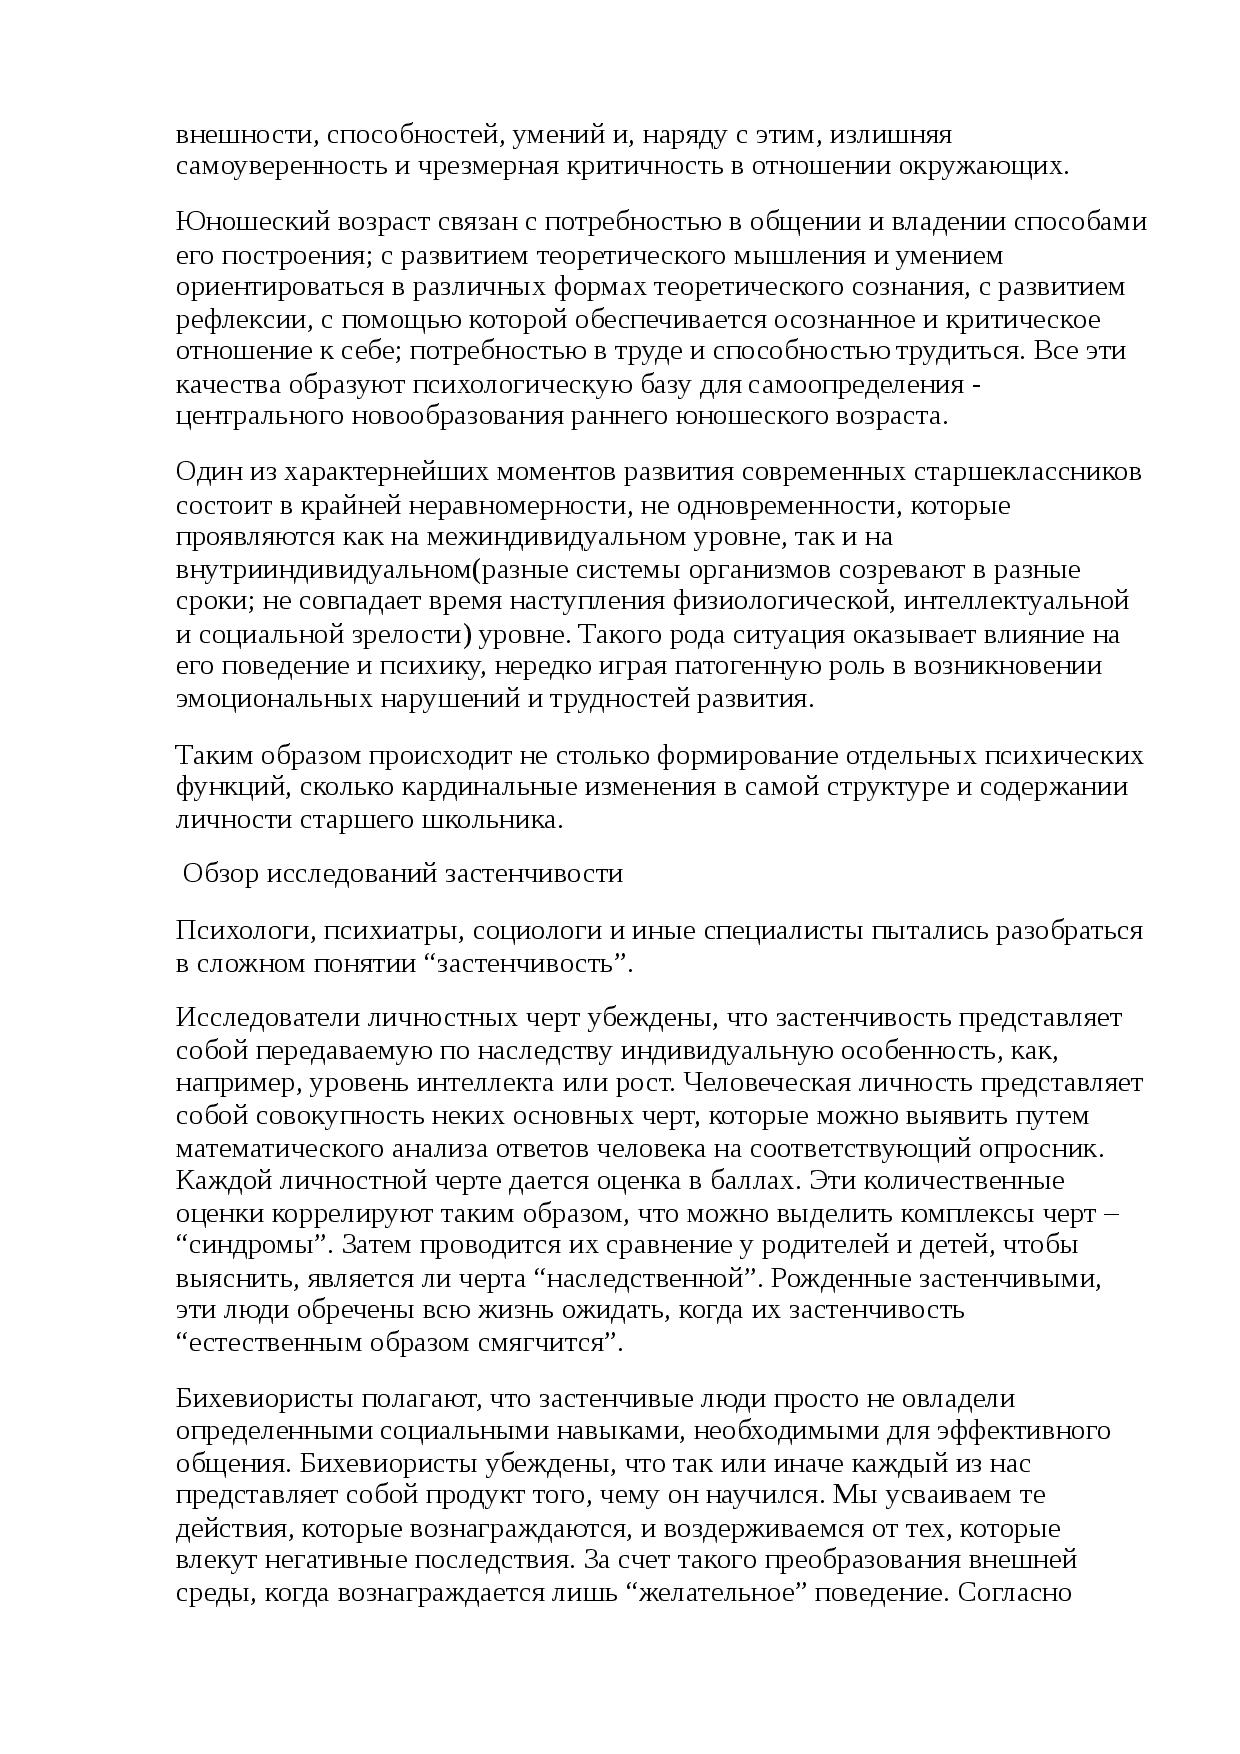 Как избавиться от робости и застенчивости за 10 шагов          | bbf.ru